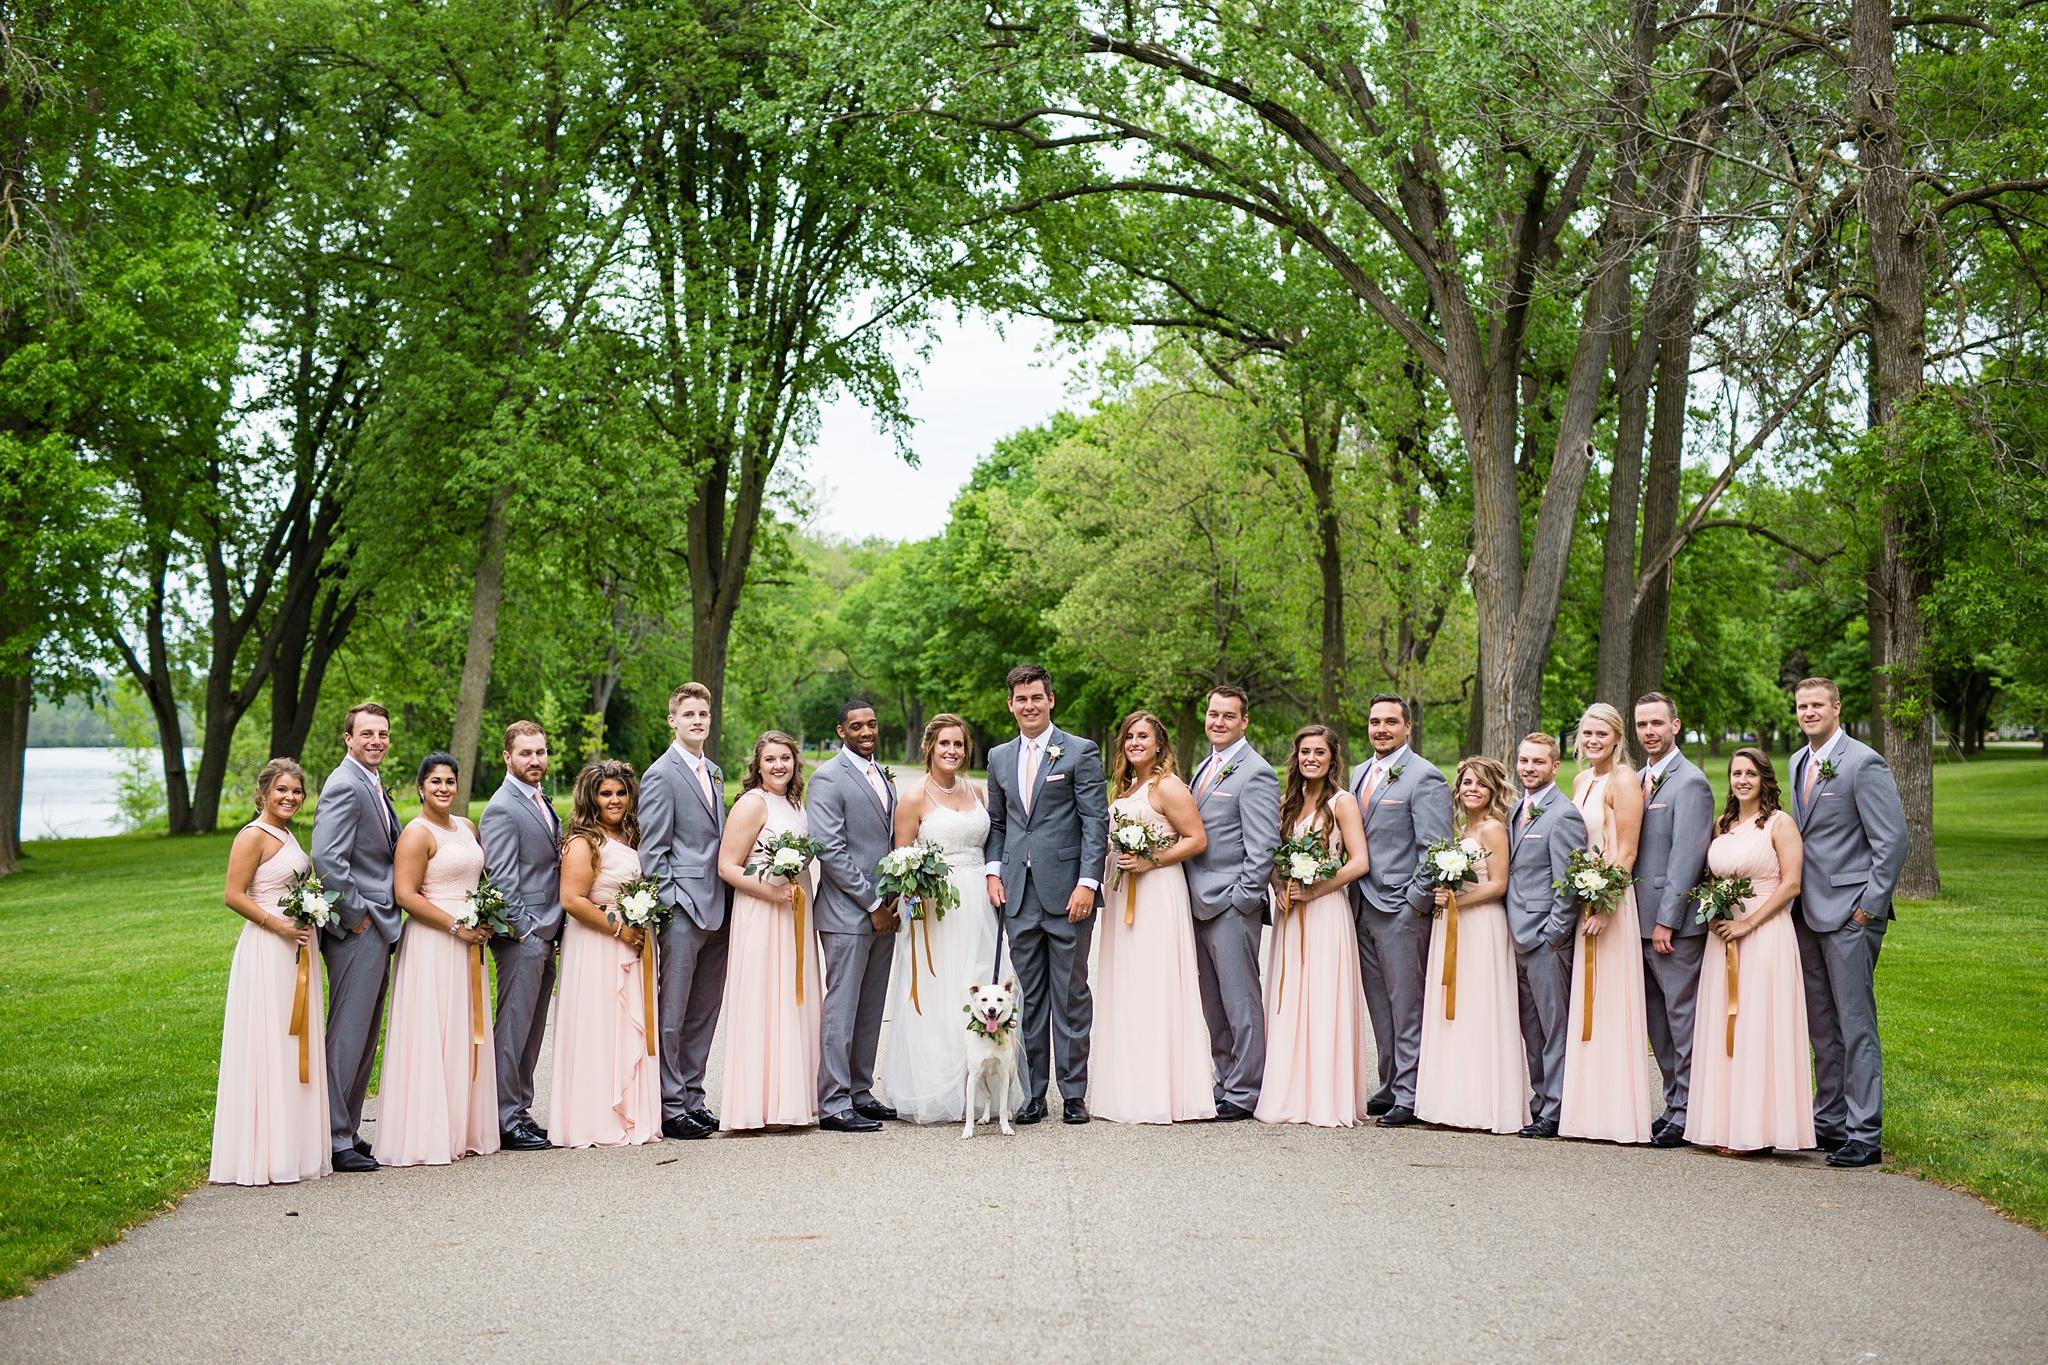 Meghan_Drew_Grand_Rapids_Cheney_place_Wedding064.JPG